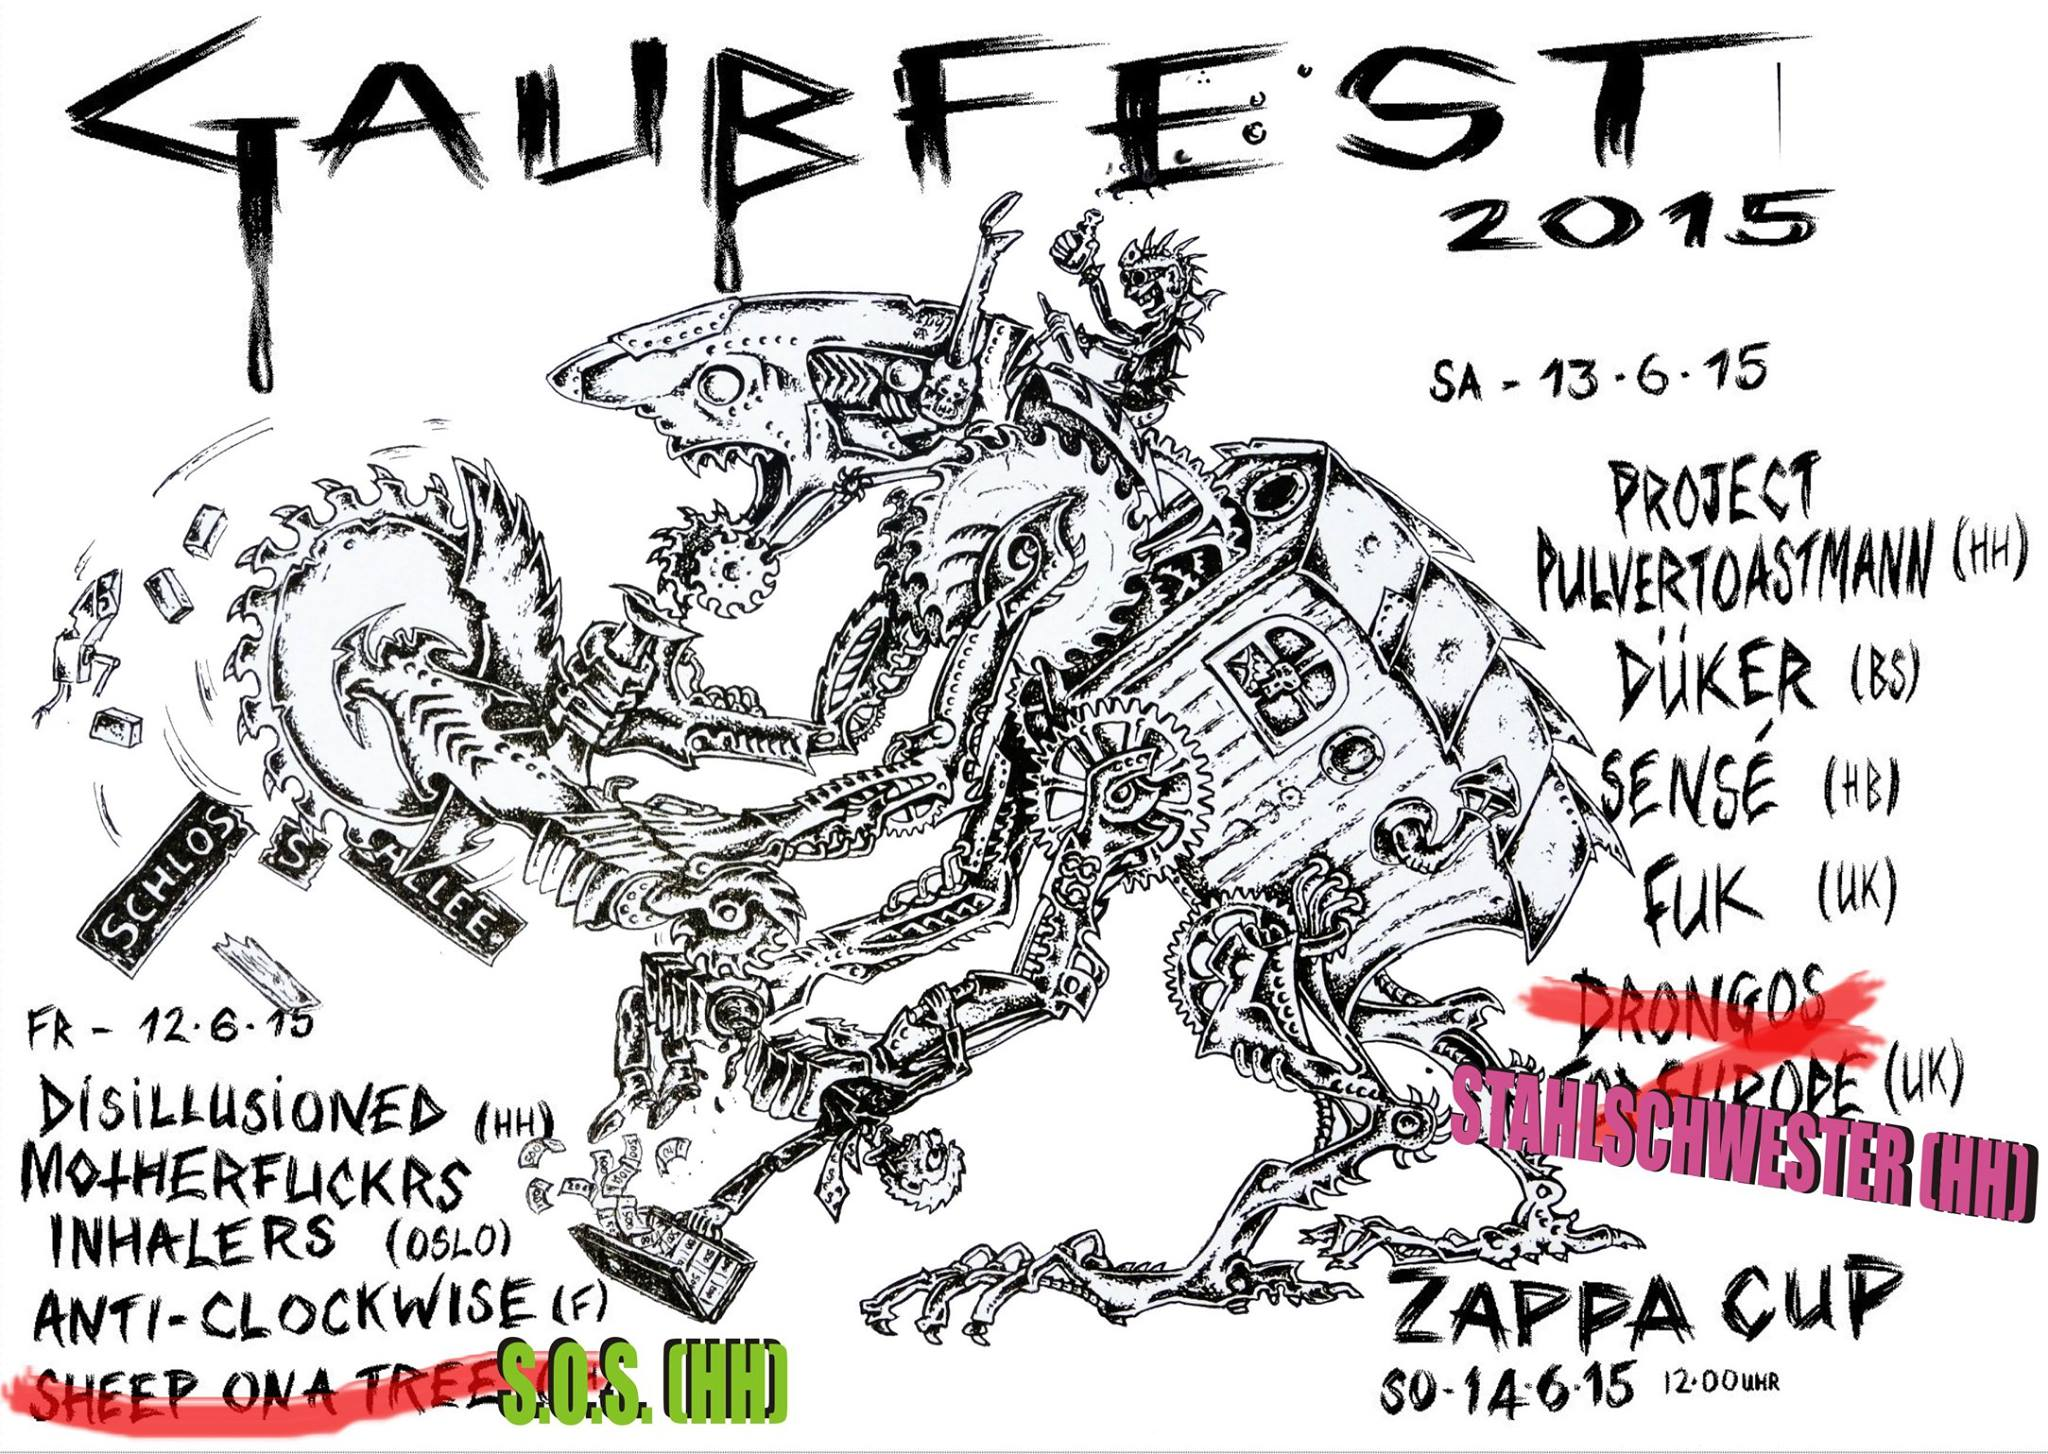 gaußfest 2015